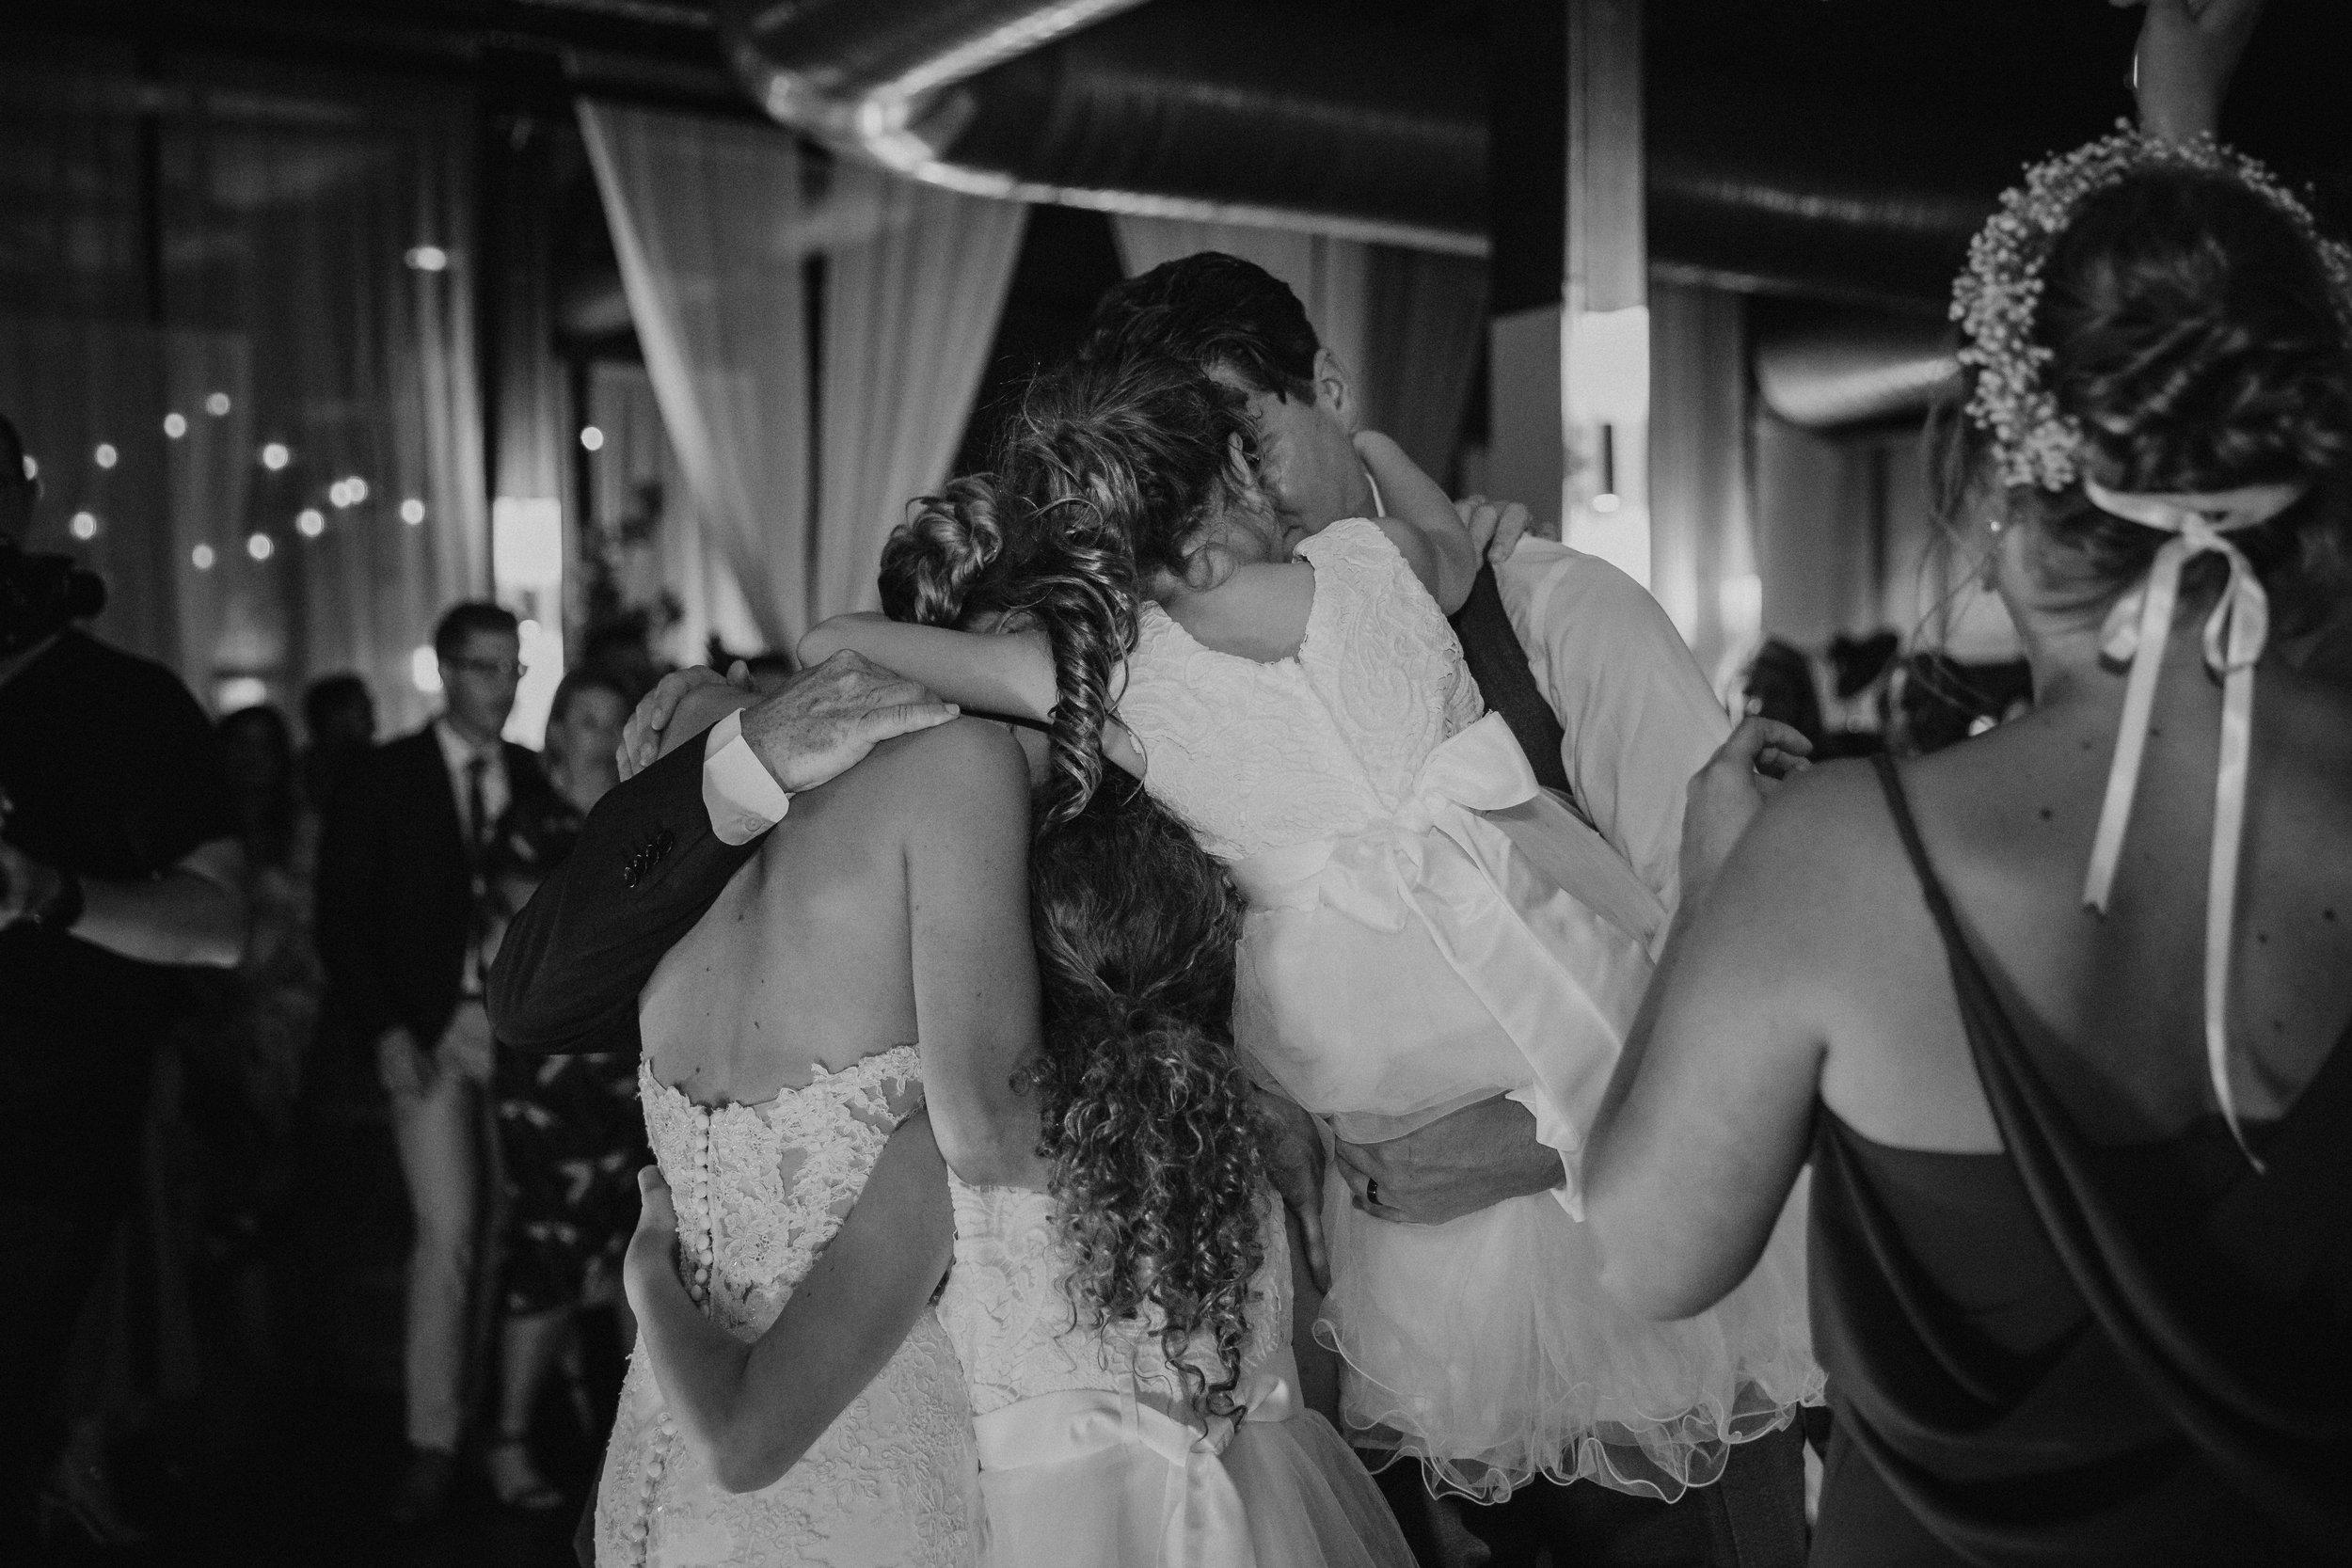 lightspace-wedding-photo.JPG